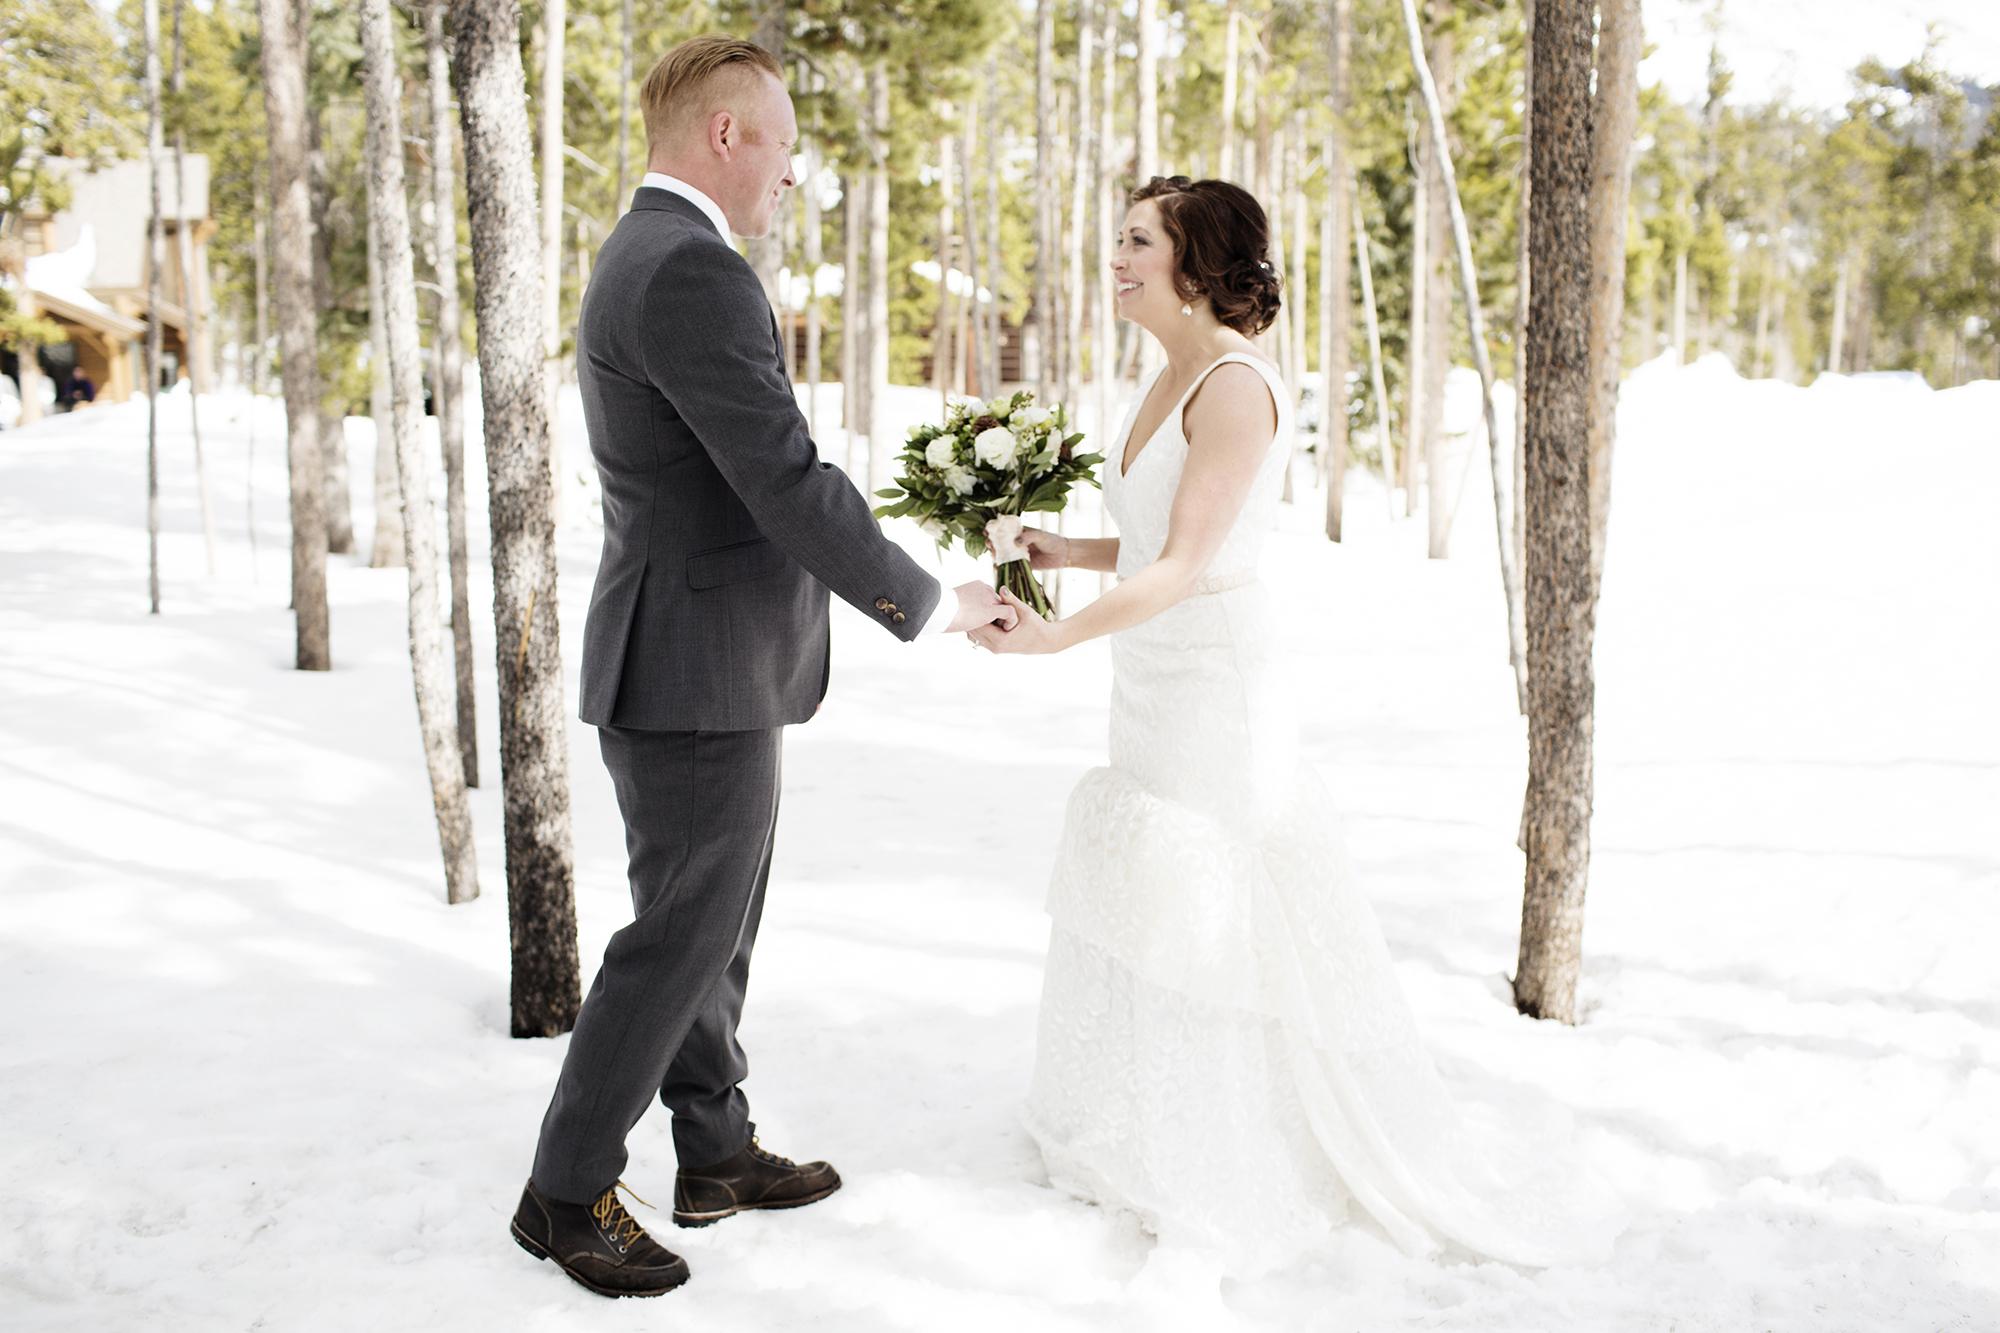 Breckenridge Colorado Wedding Photos | Destination Wedding Photographer | Photogen Inc. | Eliesa Johnson | Based in Minneapolis, Minnesota